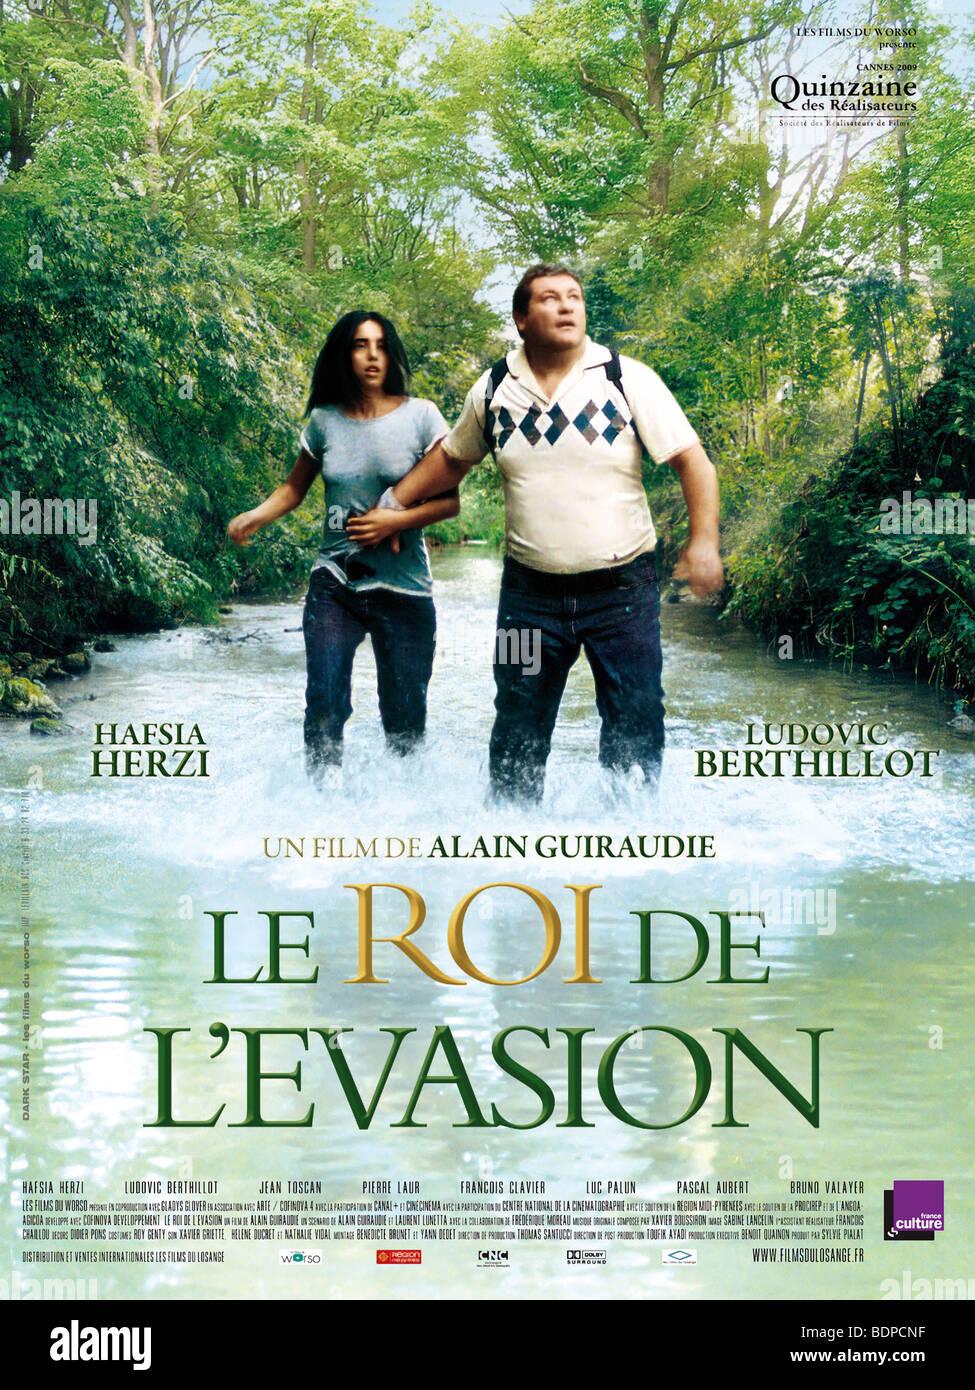 Le Roi de l'évasion Year : 2009 Director : Alain Guiraudie Ludovic Berthillot, Hafsia Herzi Movie - Stock Image